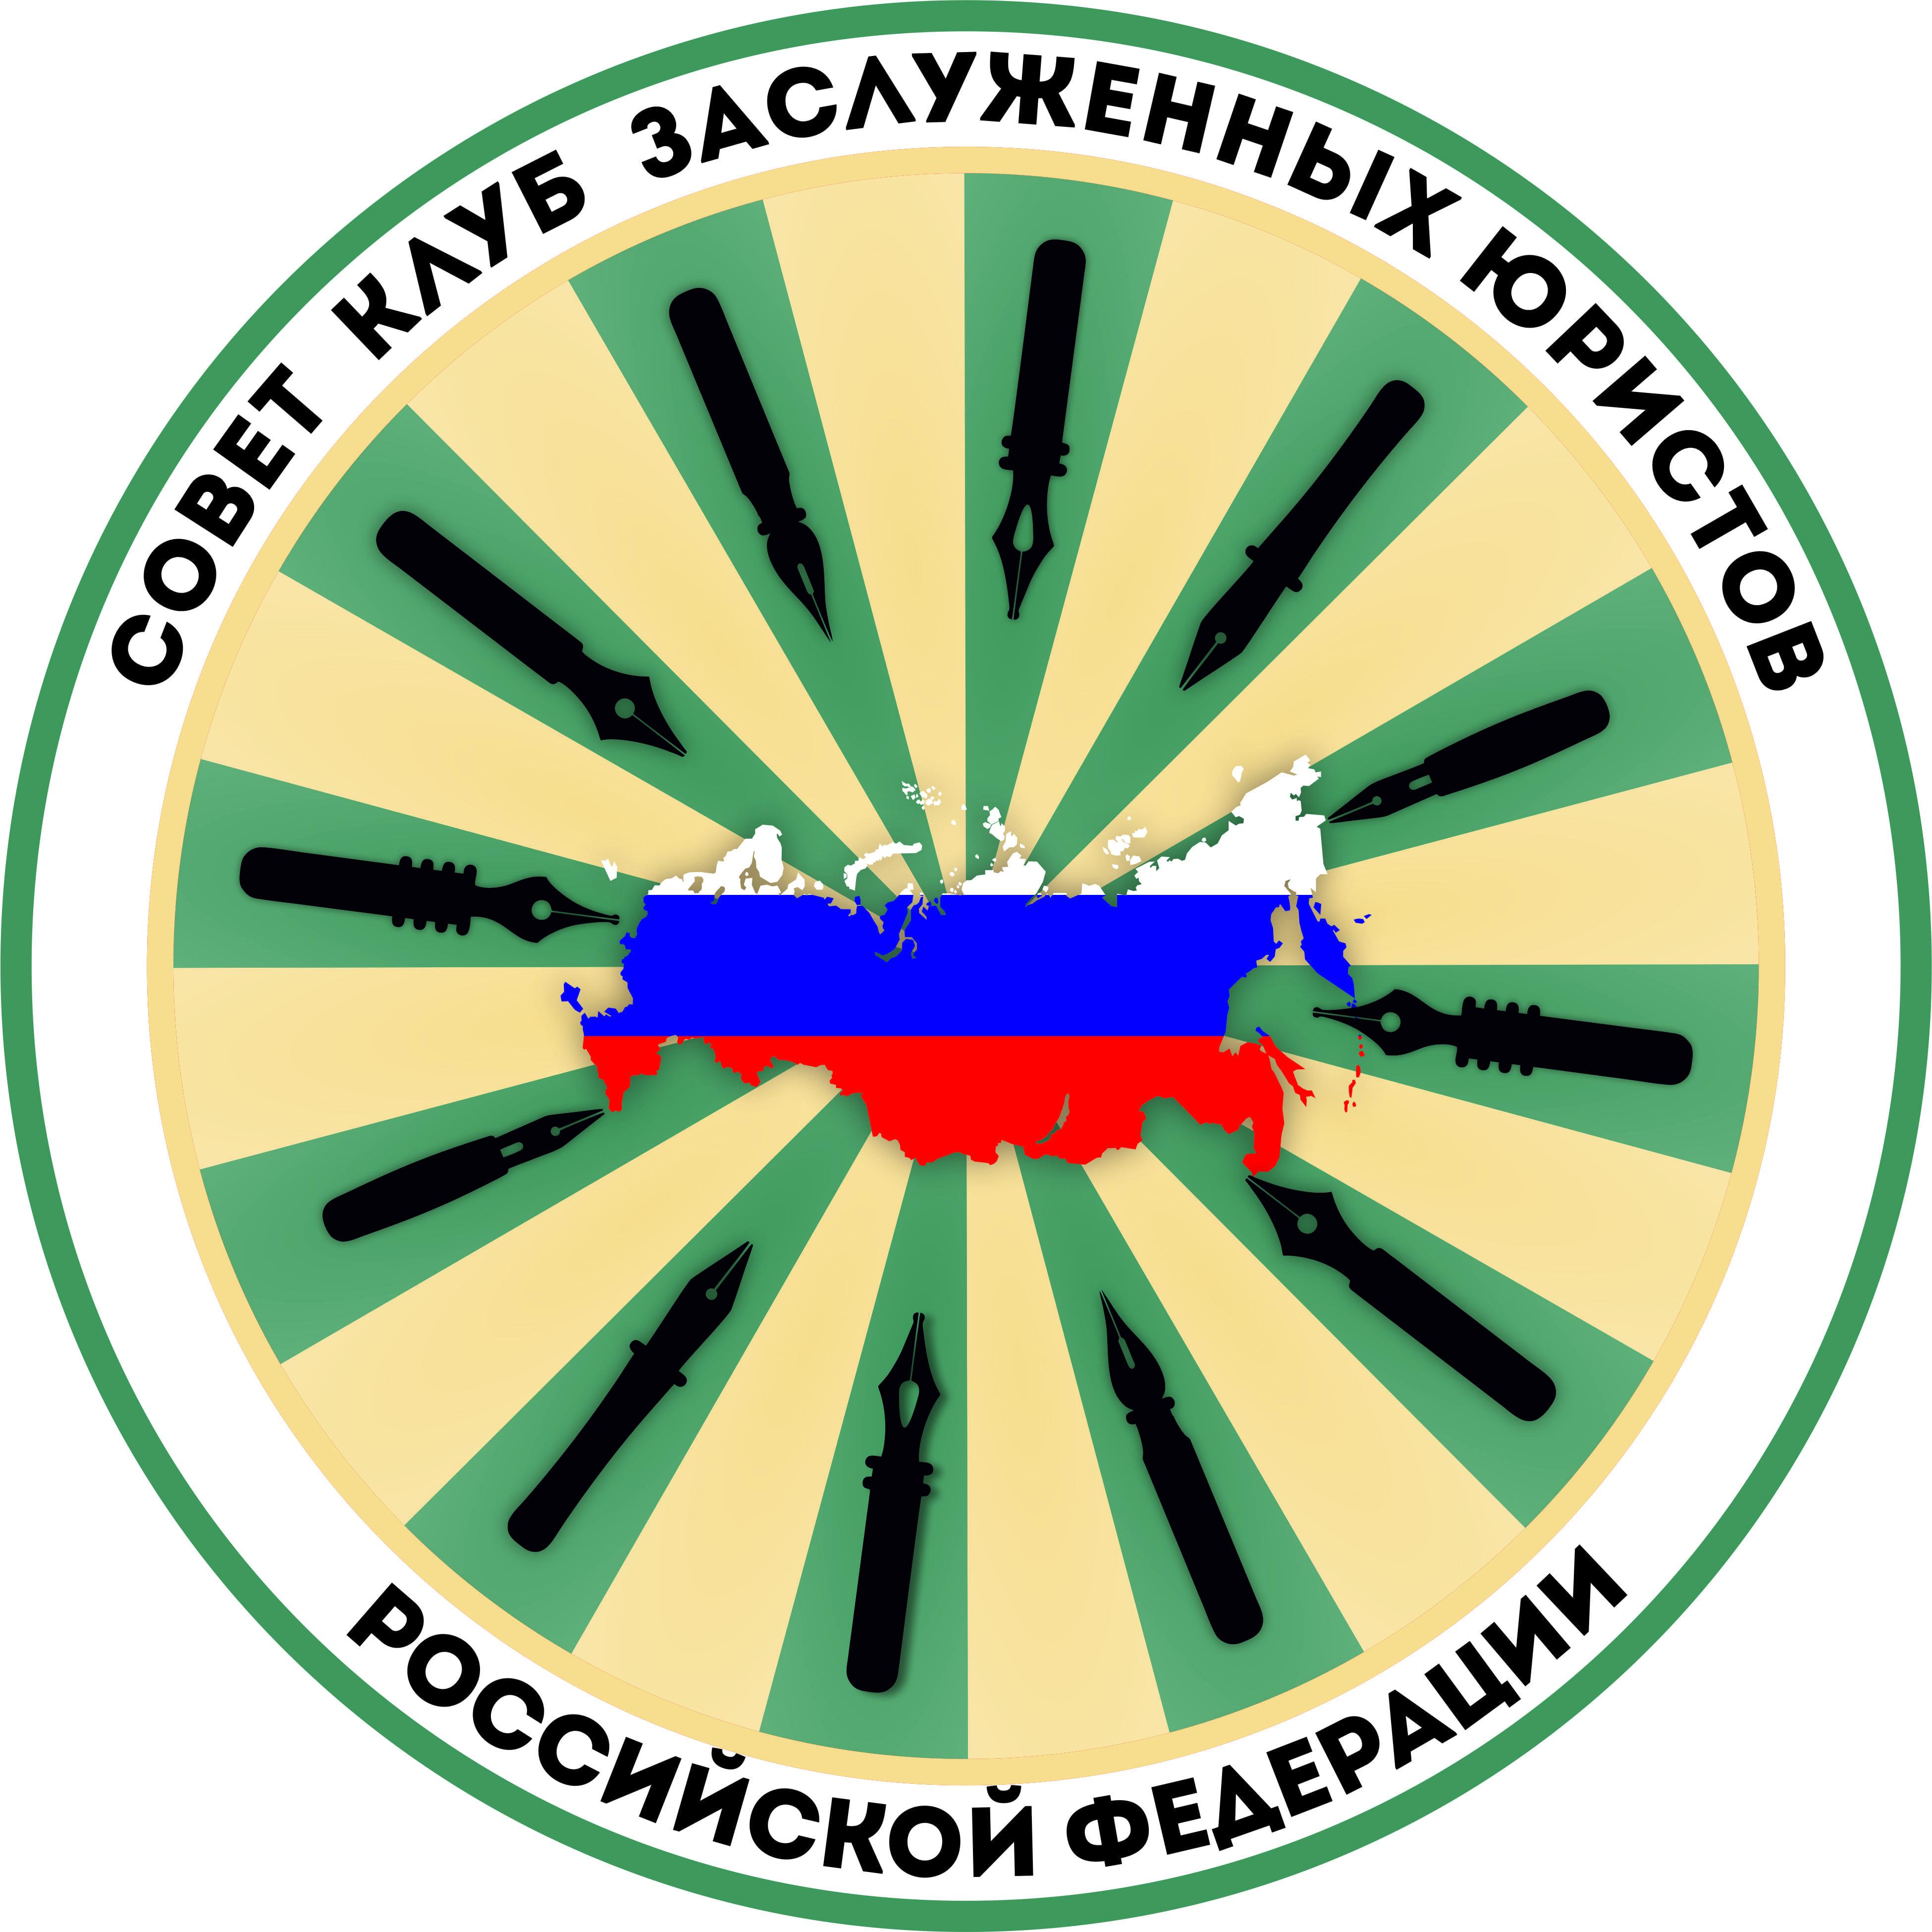 Разработка логотипа Совета (Клуба) заслуженных юристов Российской Федерации фото f_3915e4180f339402.jpg